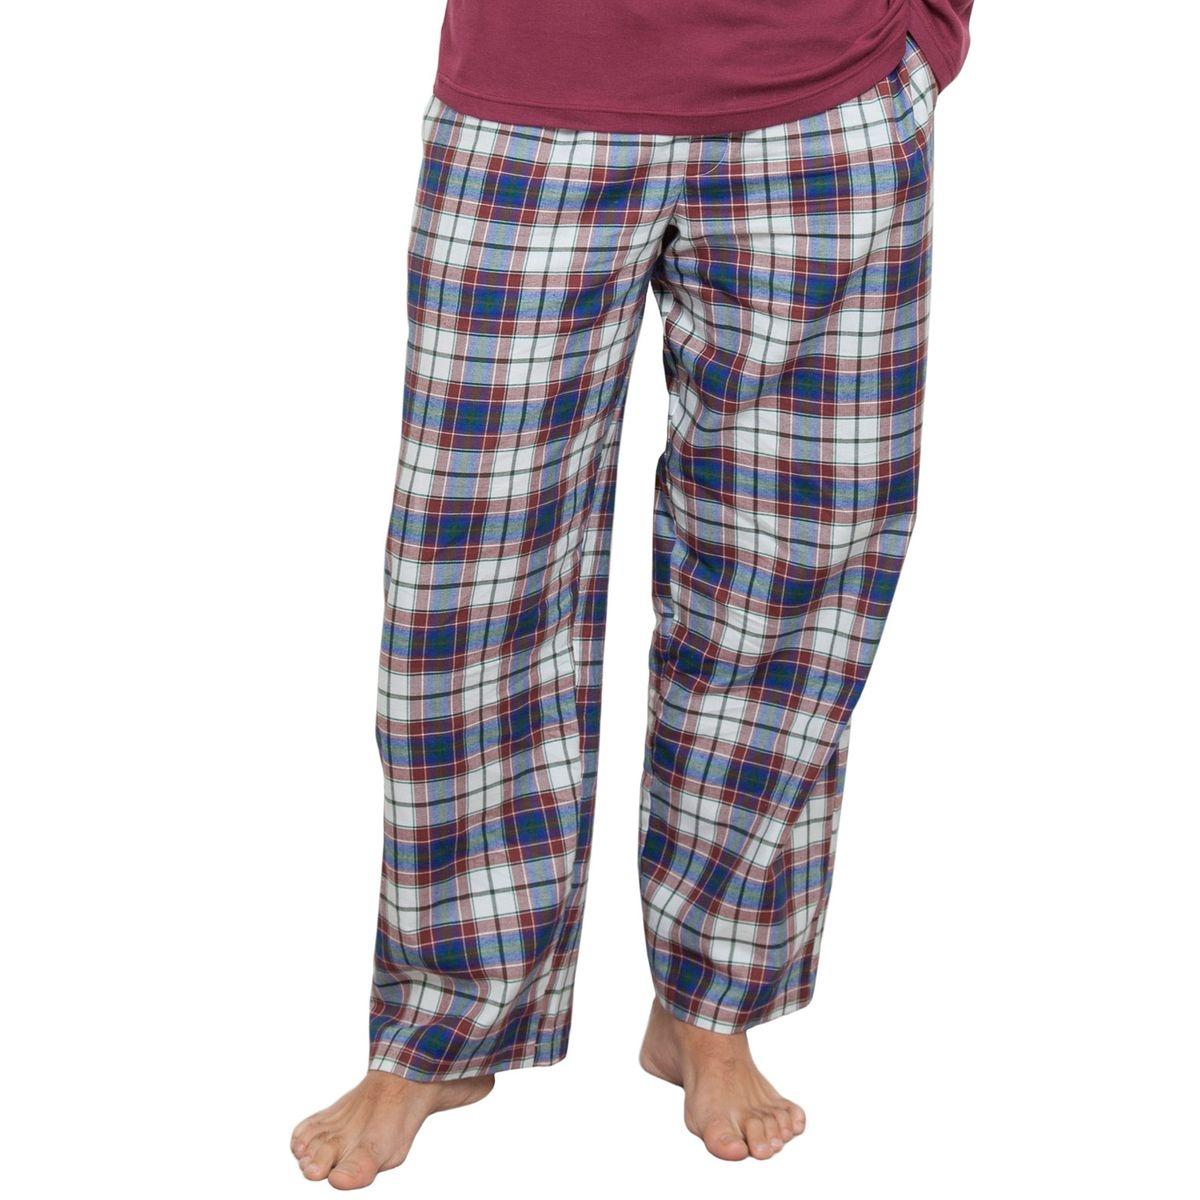 Bas de Pyjama à Carreaux AUSTIN